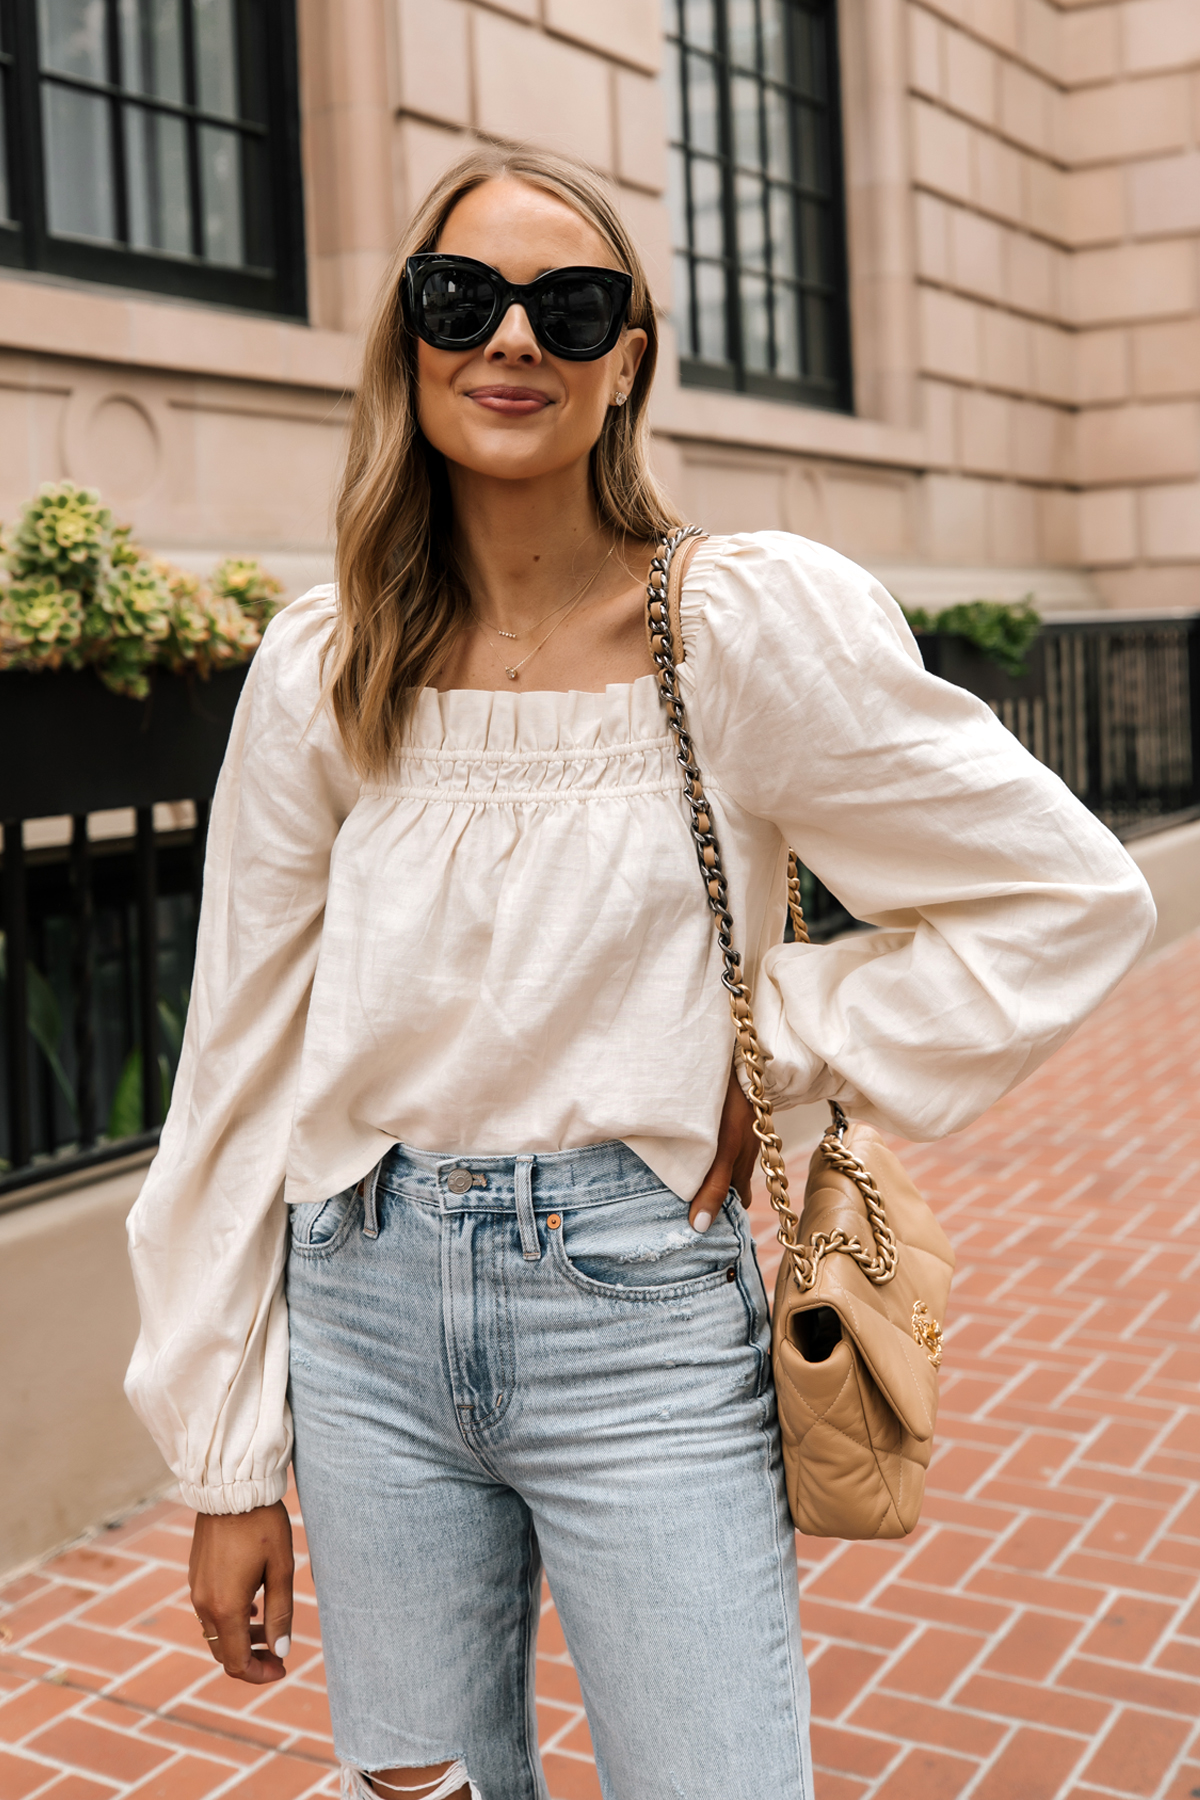 Fashion Jackson Wearing Beige Linen Puff Sleeve Top Ripped Jeans Chanel Beige Handbag